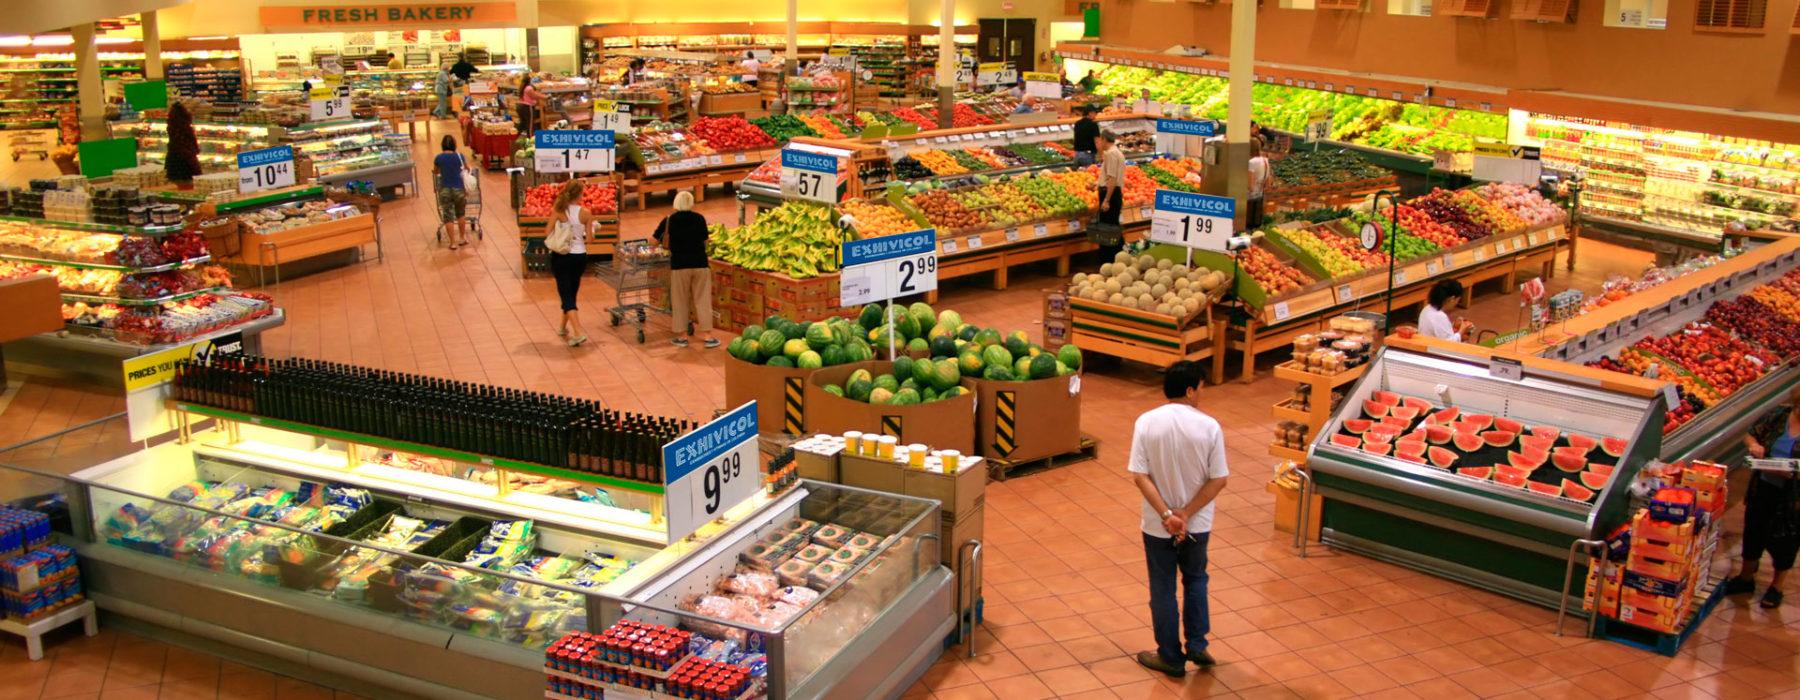 Encuentra todo para supermercados.